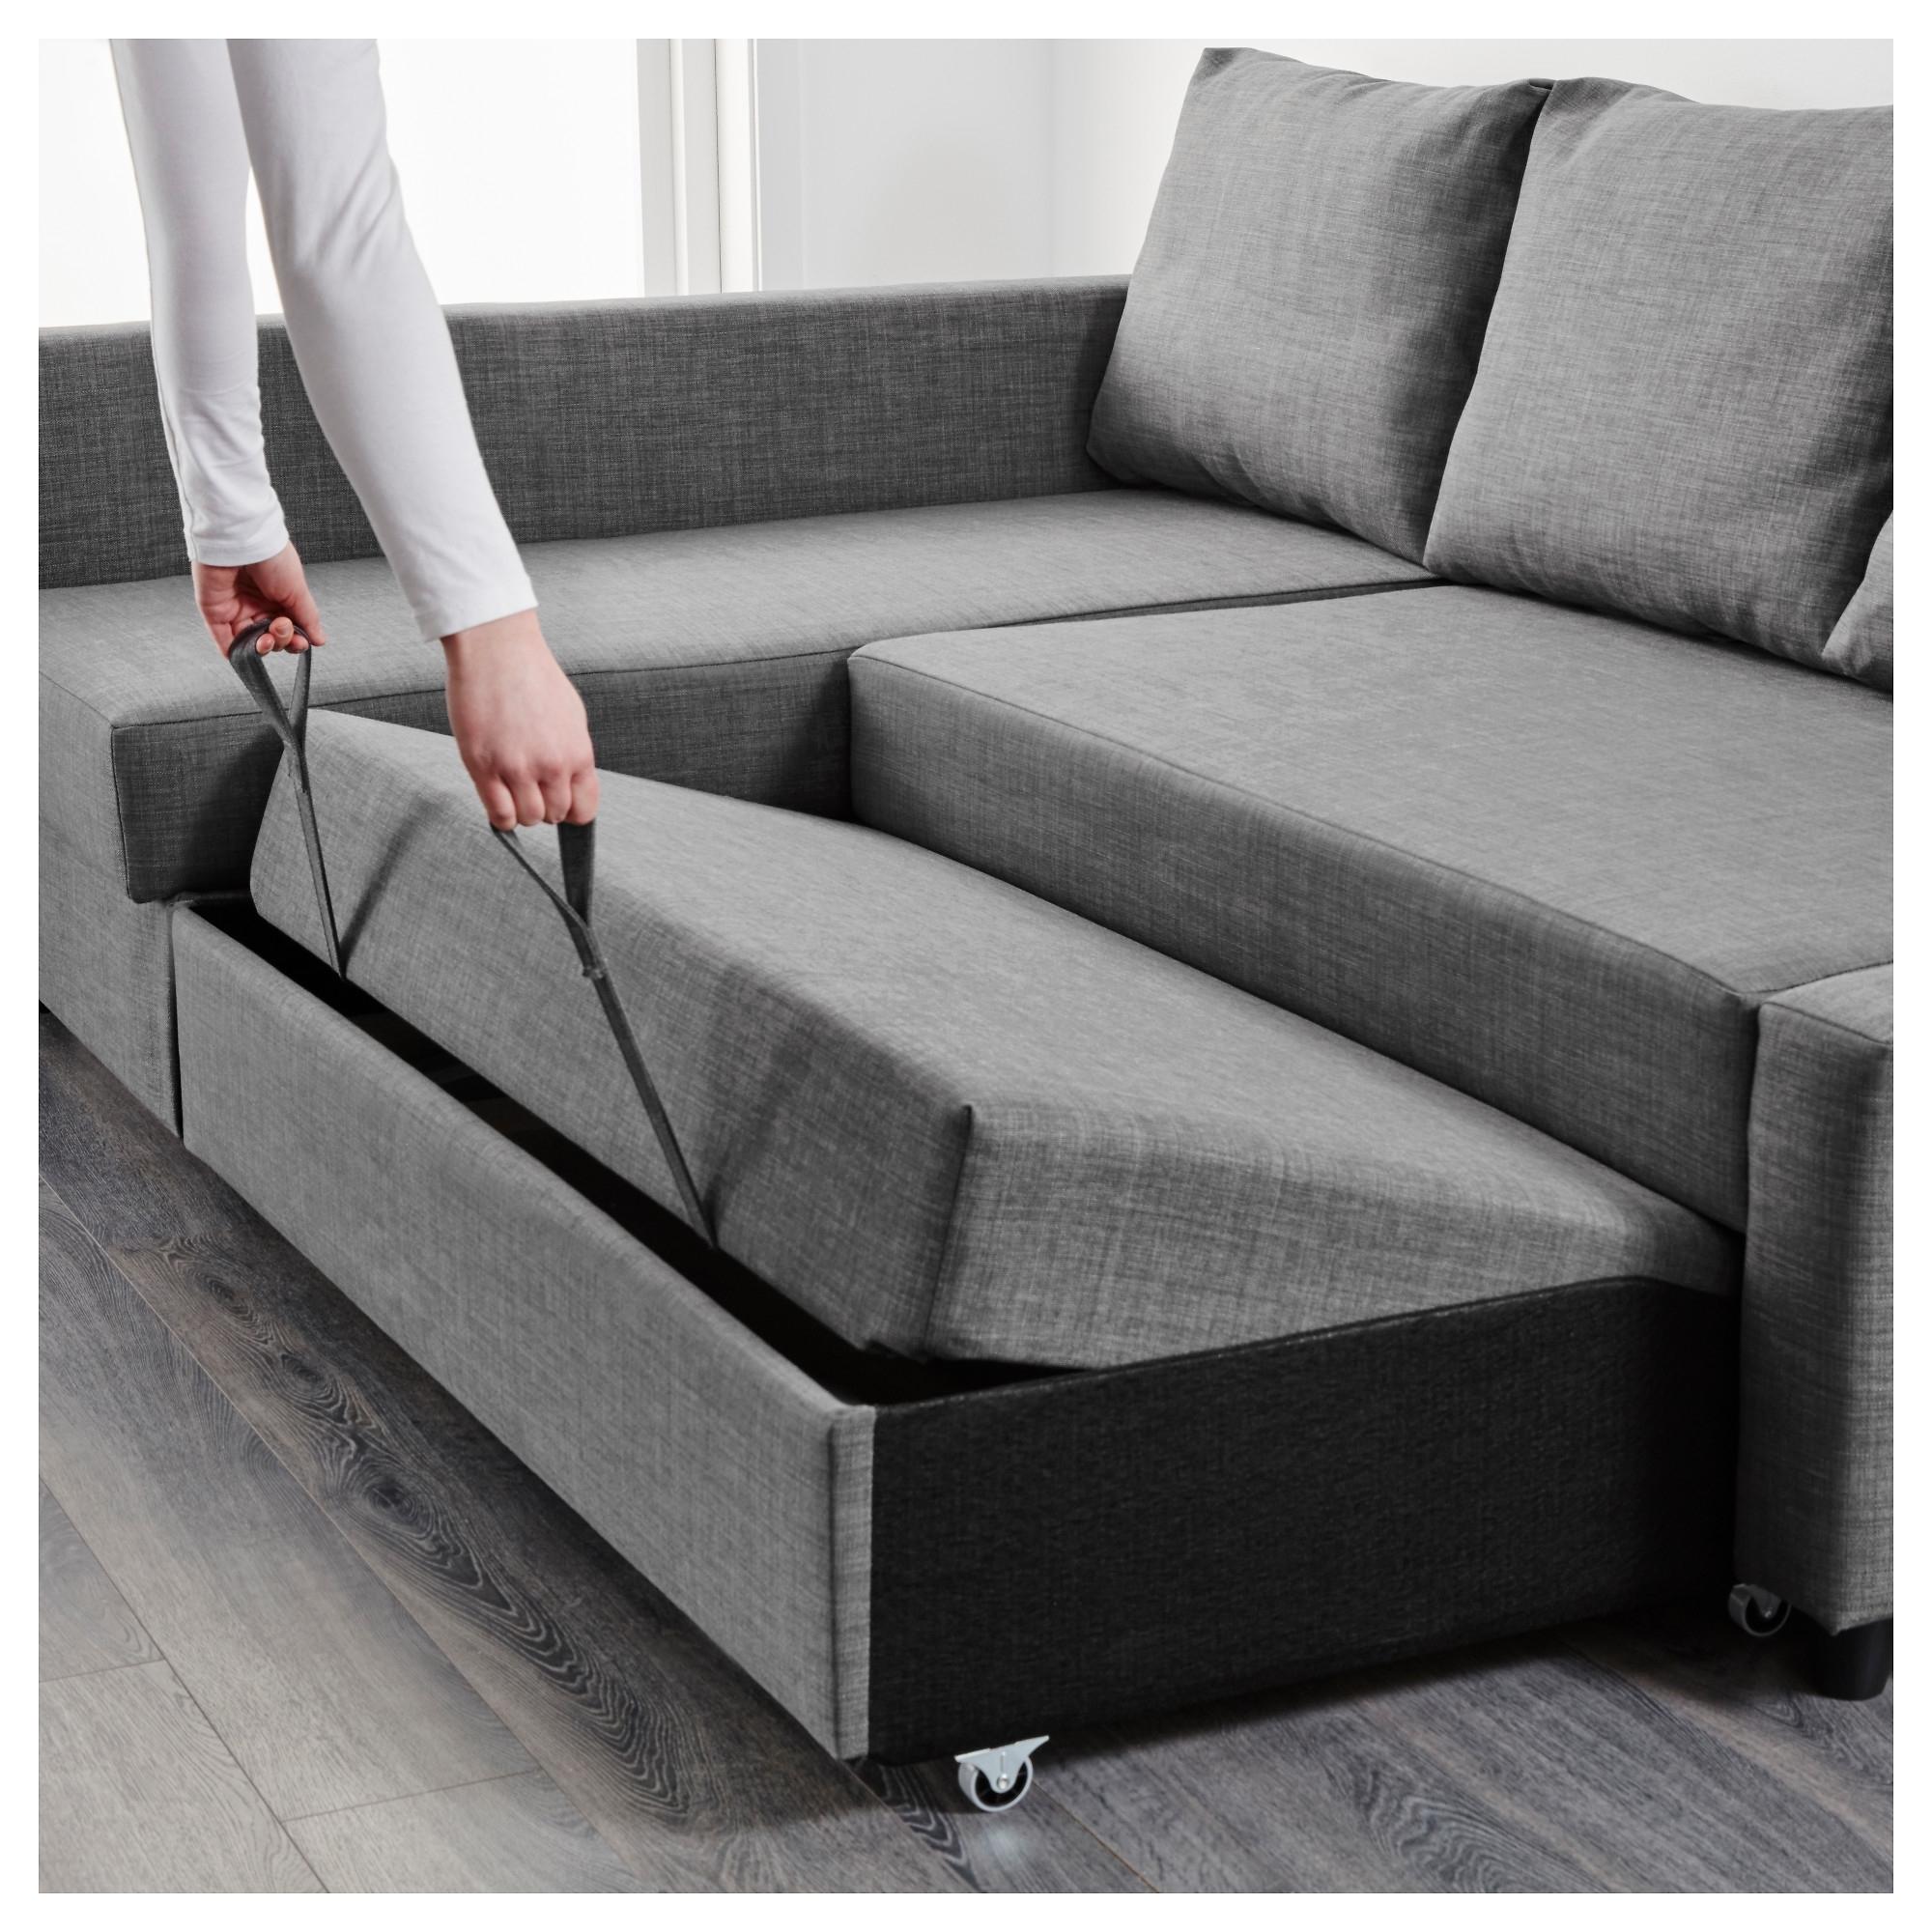 Friheten Sleeper Sectional,3 Seat W/storage – Skiftebo Beige – Ikea With Ikea Sectional Sleeper Sofas (View 2 of 10)